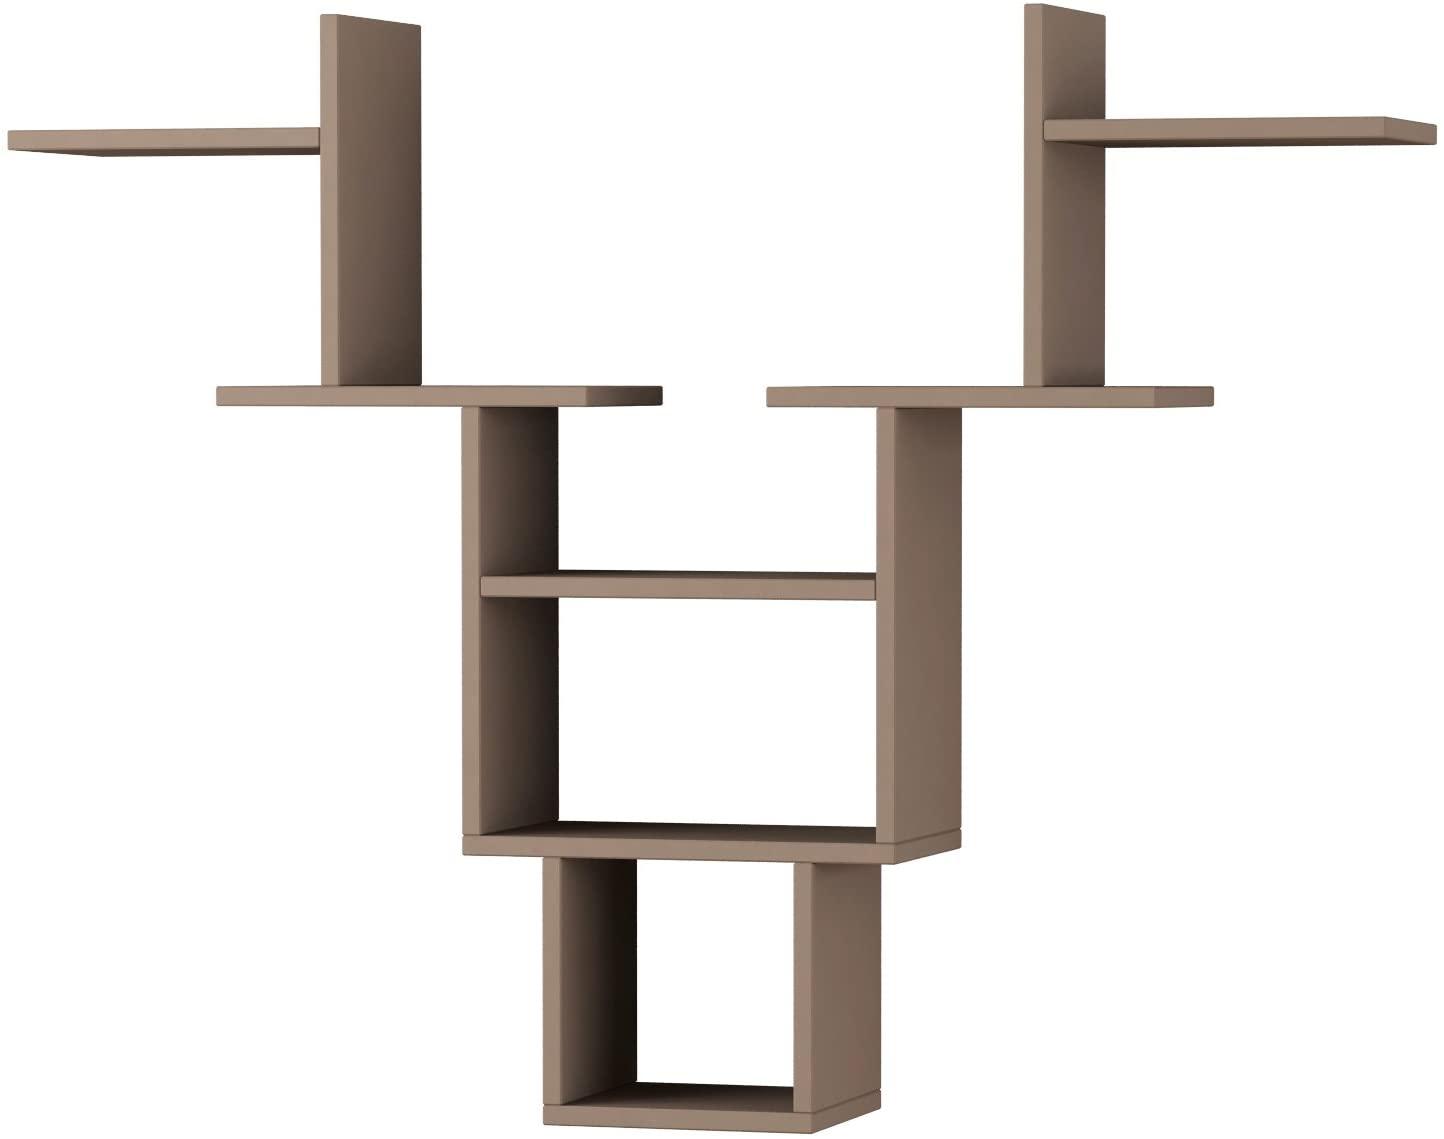 Ada Home Décor Whitetail Wall Shelf, 50'' x 39'' x 9'', Light Mocha